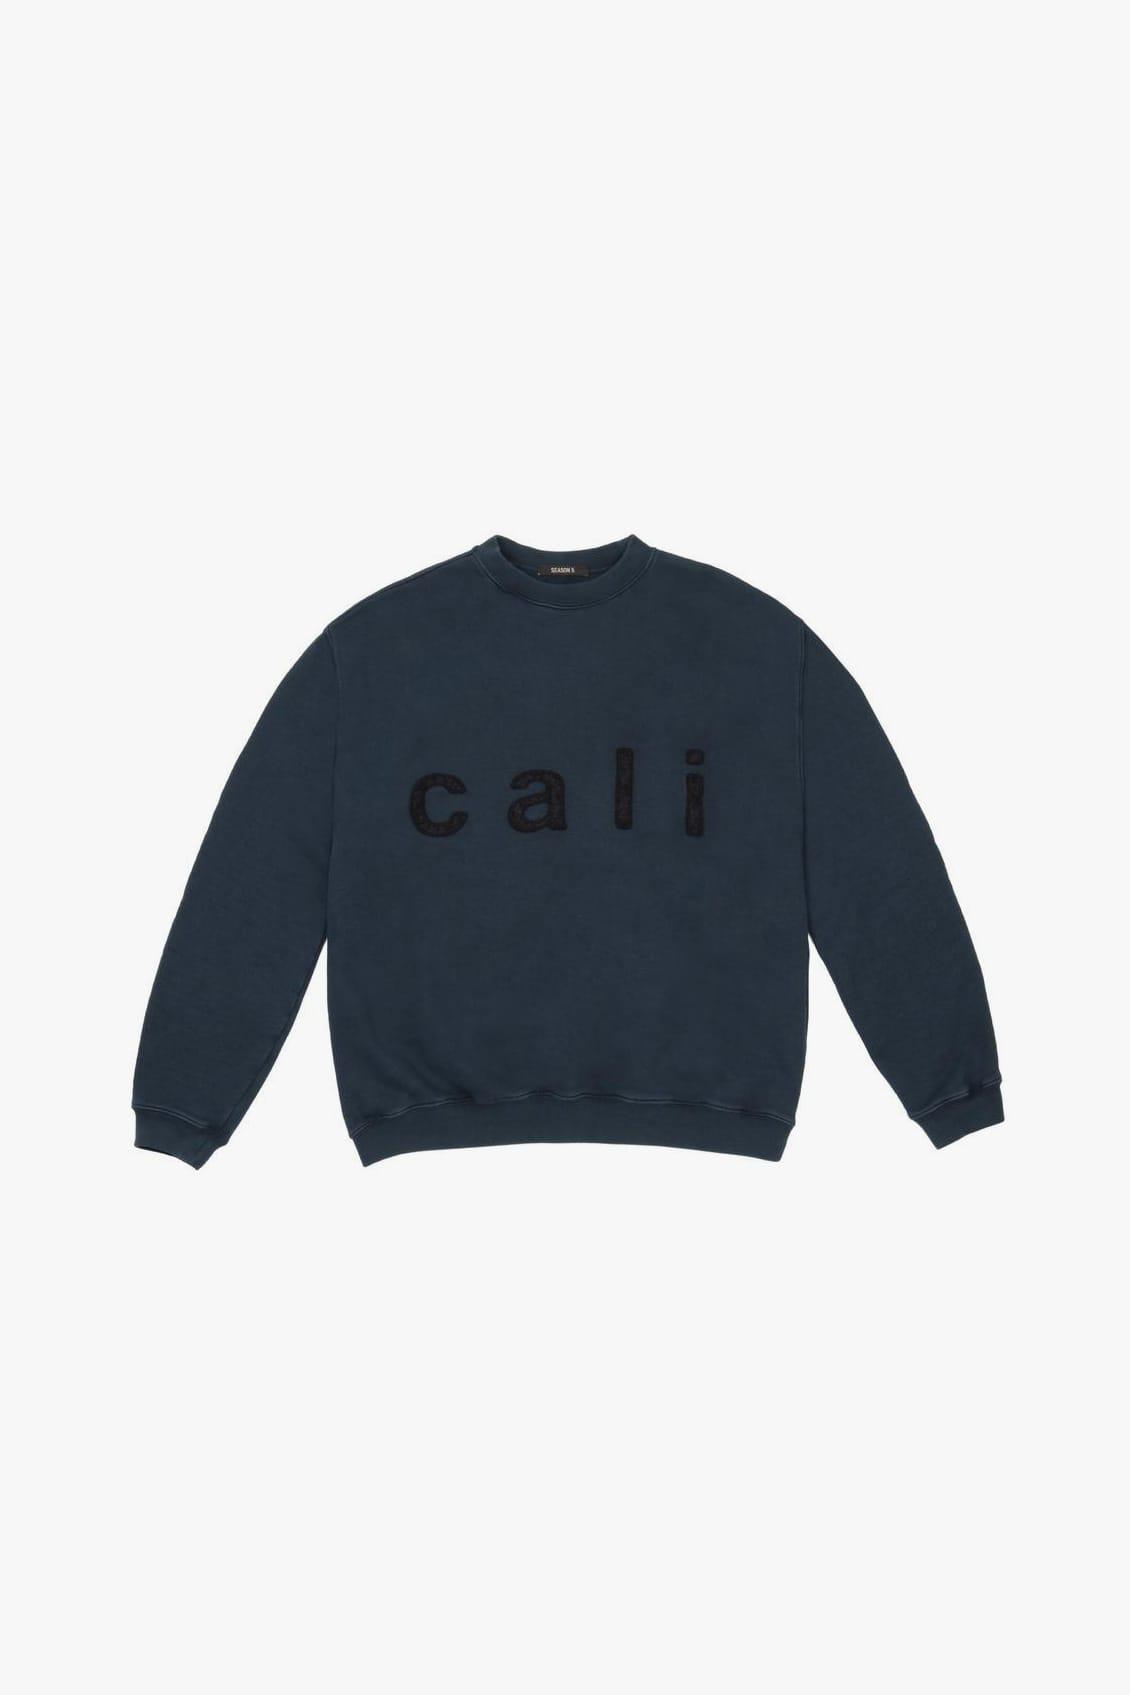 yeezy sweater season 5